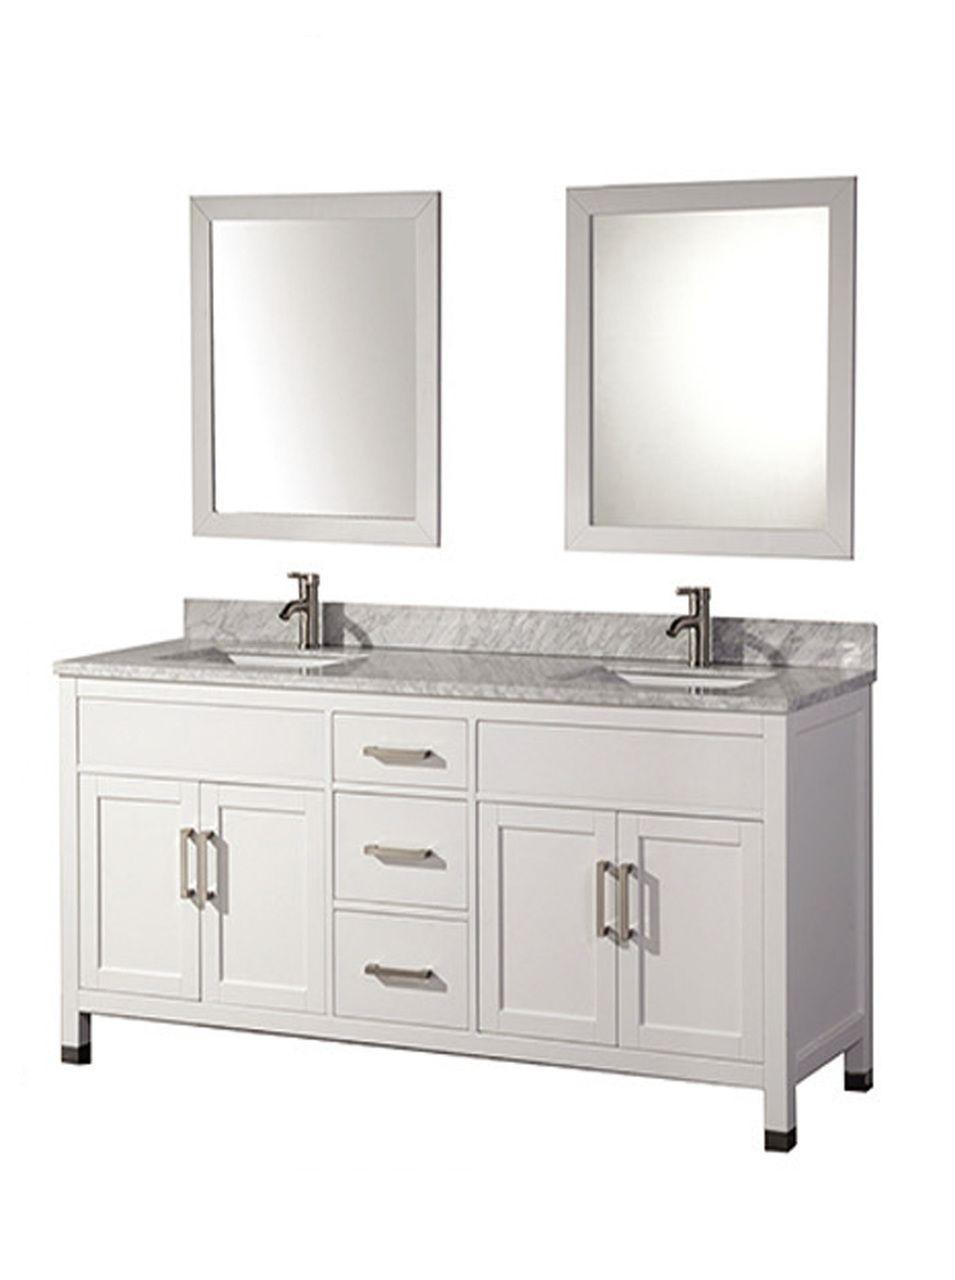 Photo Album Gallery Acer Inch White Solid Wood Double Bathroom Vanity